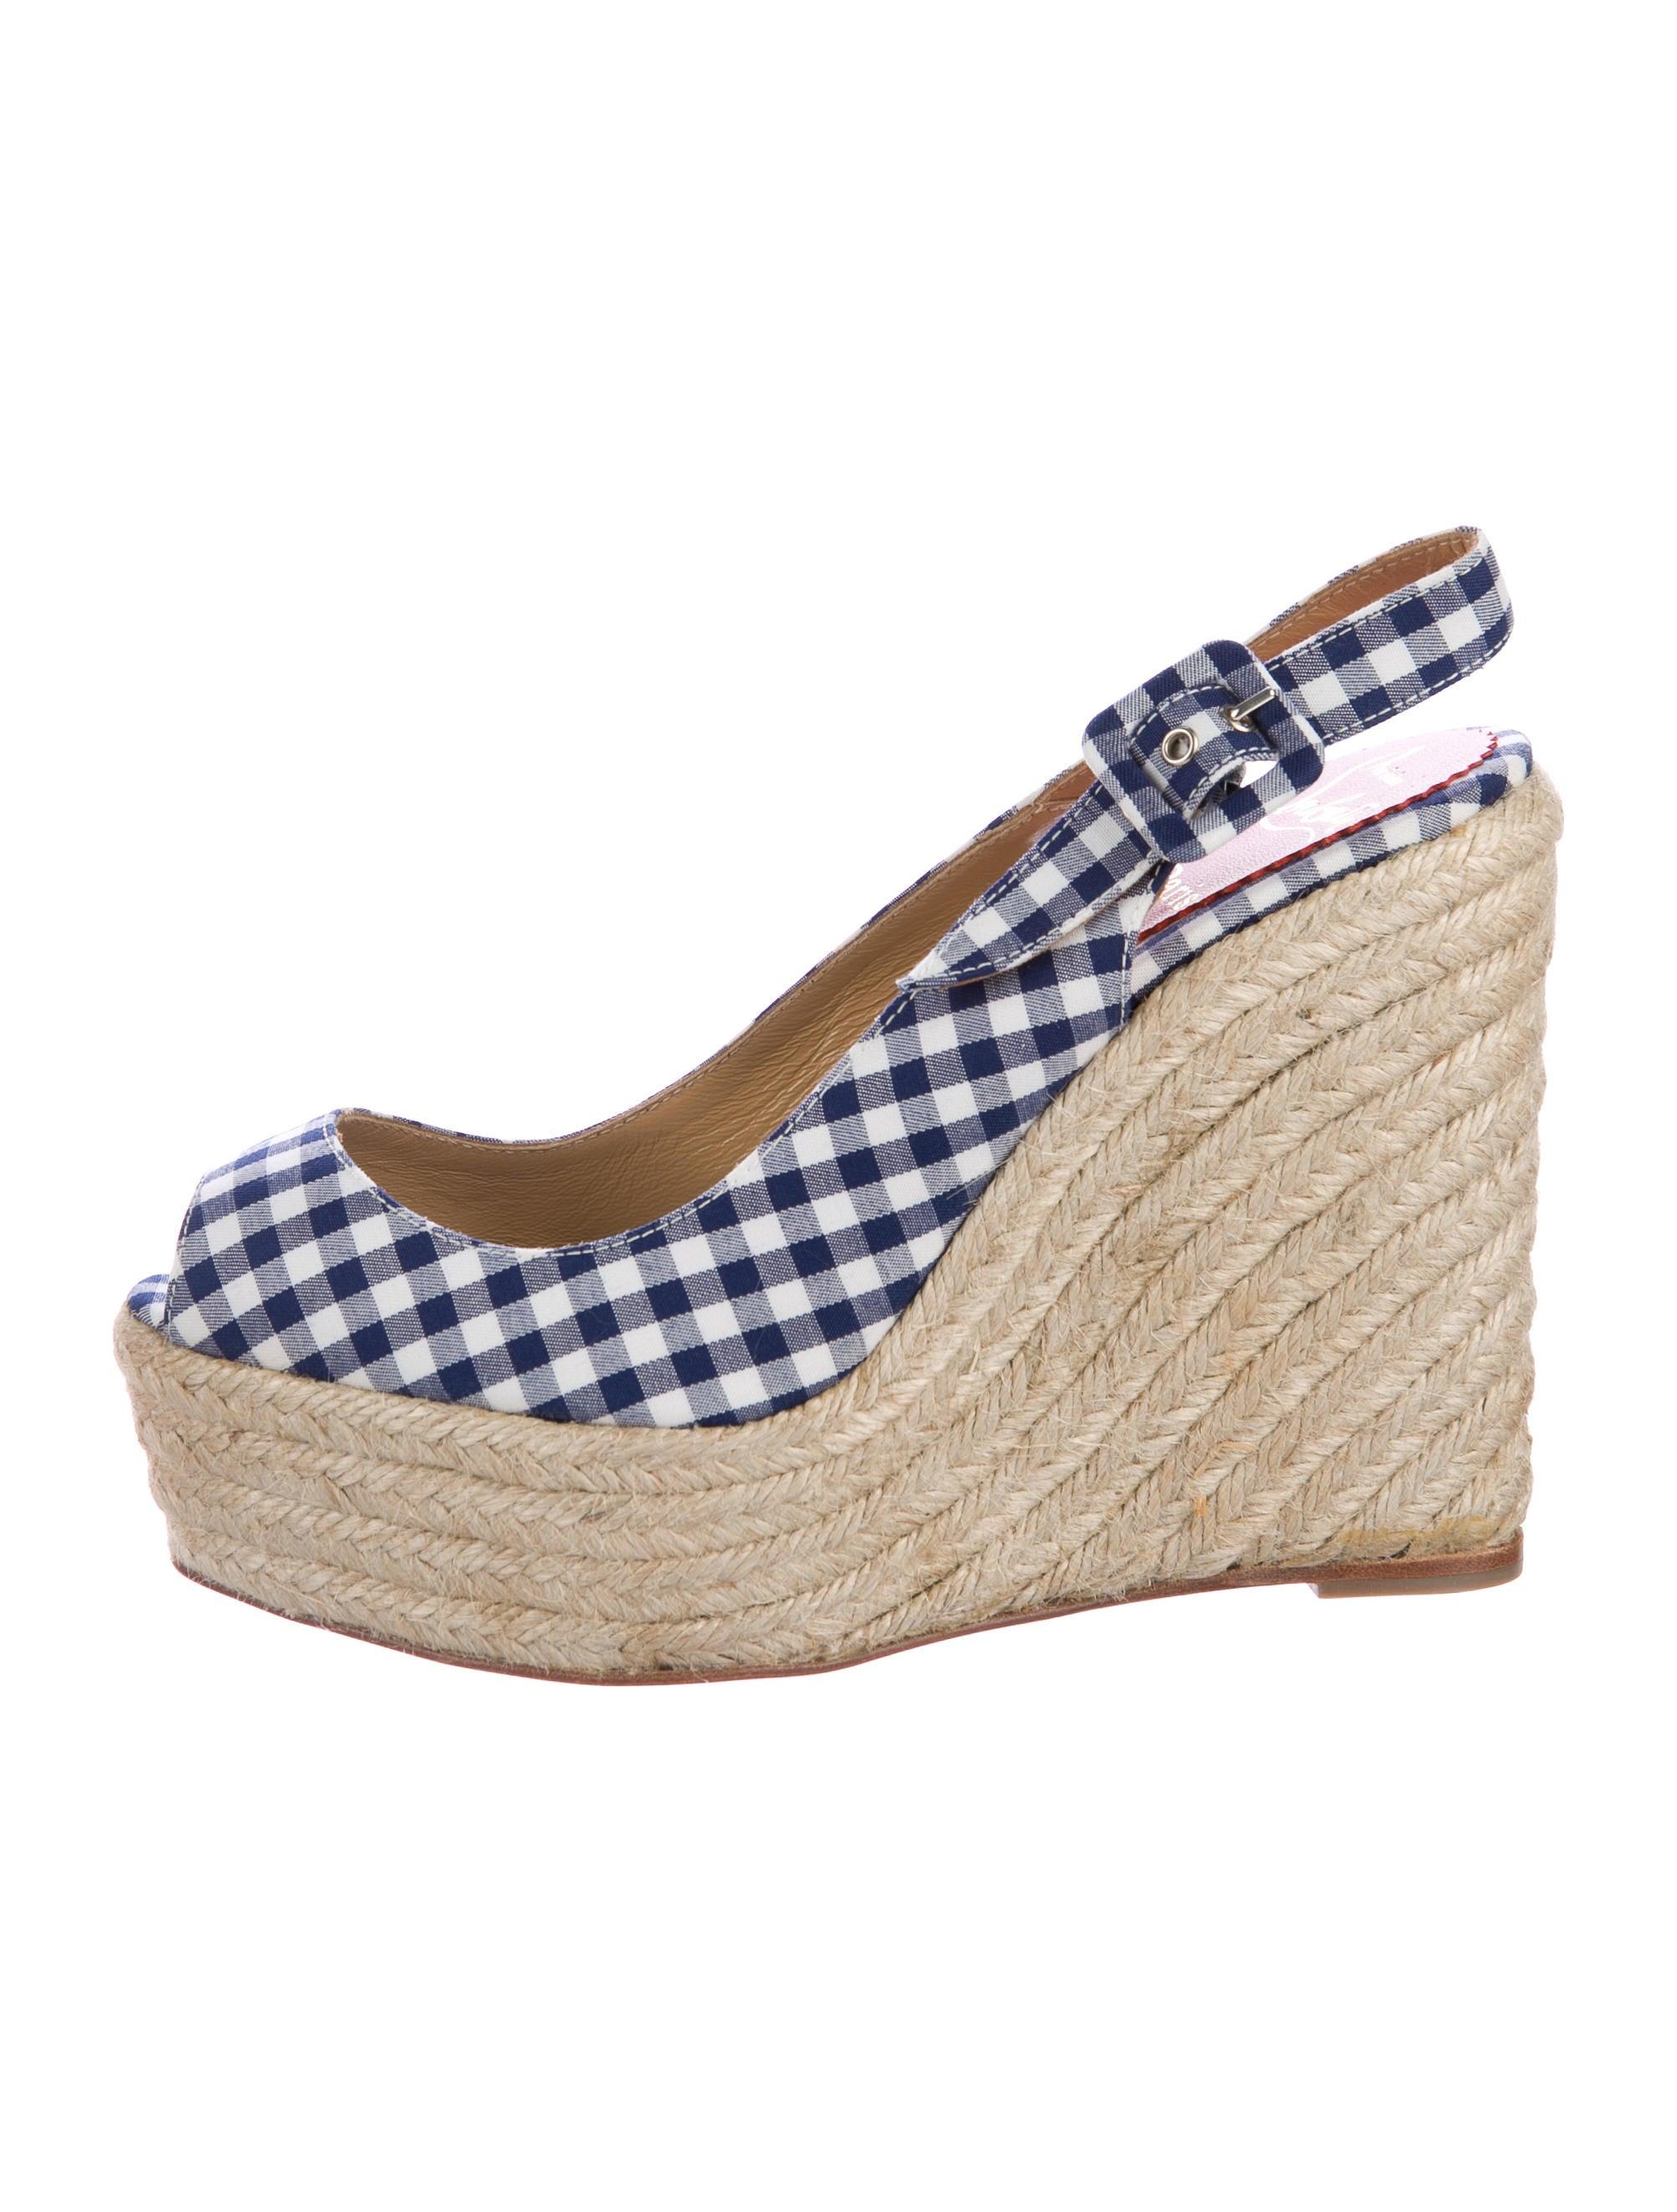 christian louboutin gingham slingback espadrilles shoes